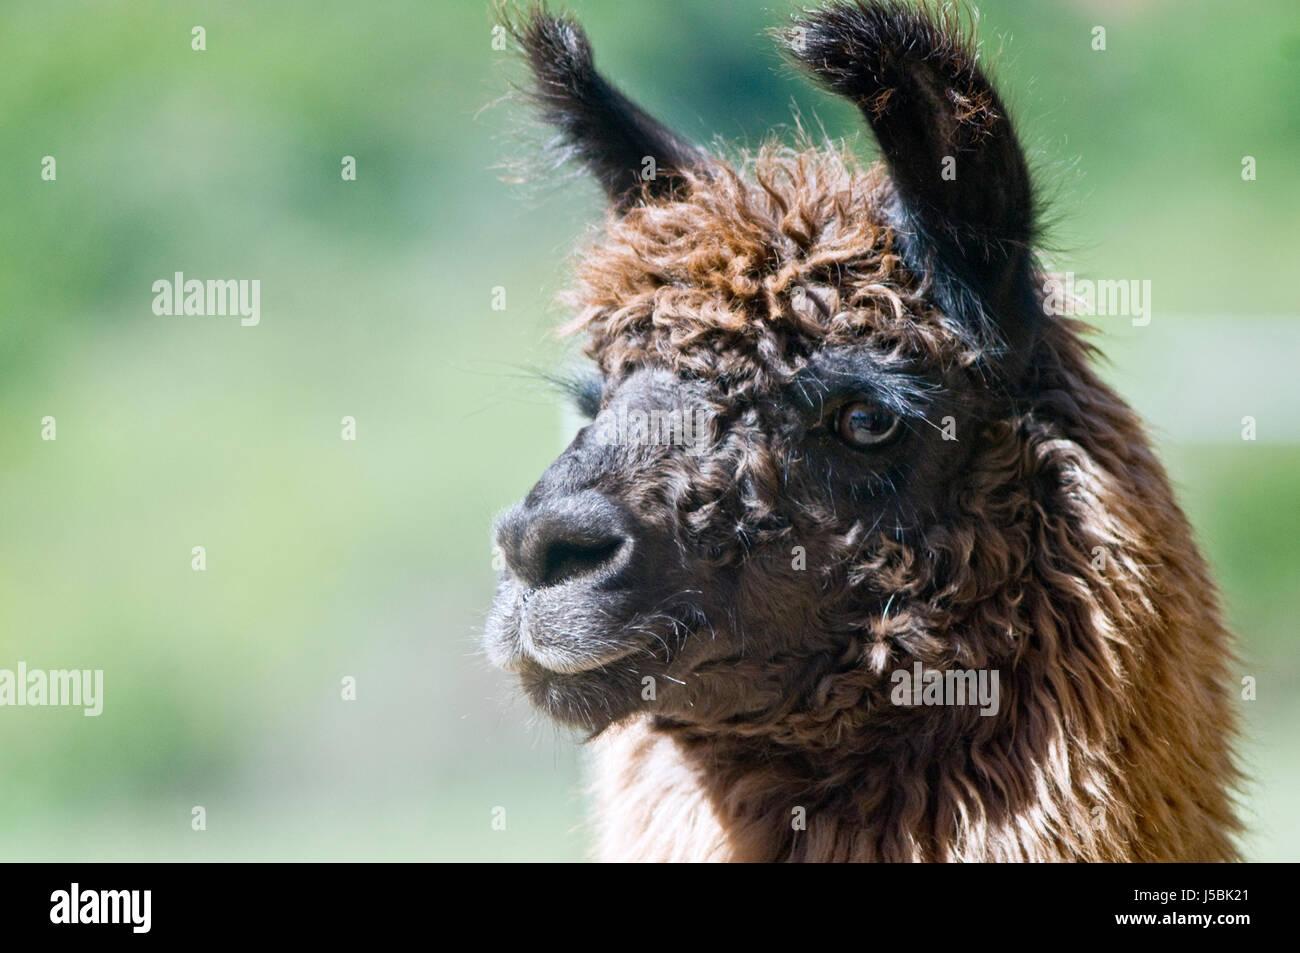 Brown llama portrait - Stock Image